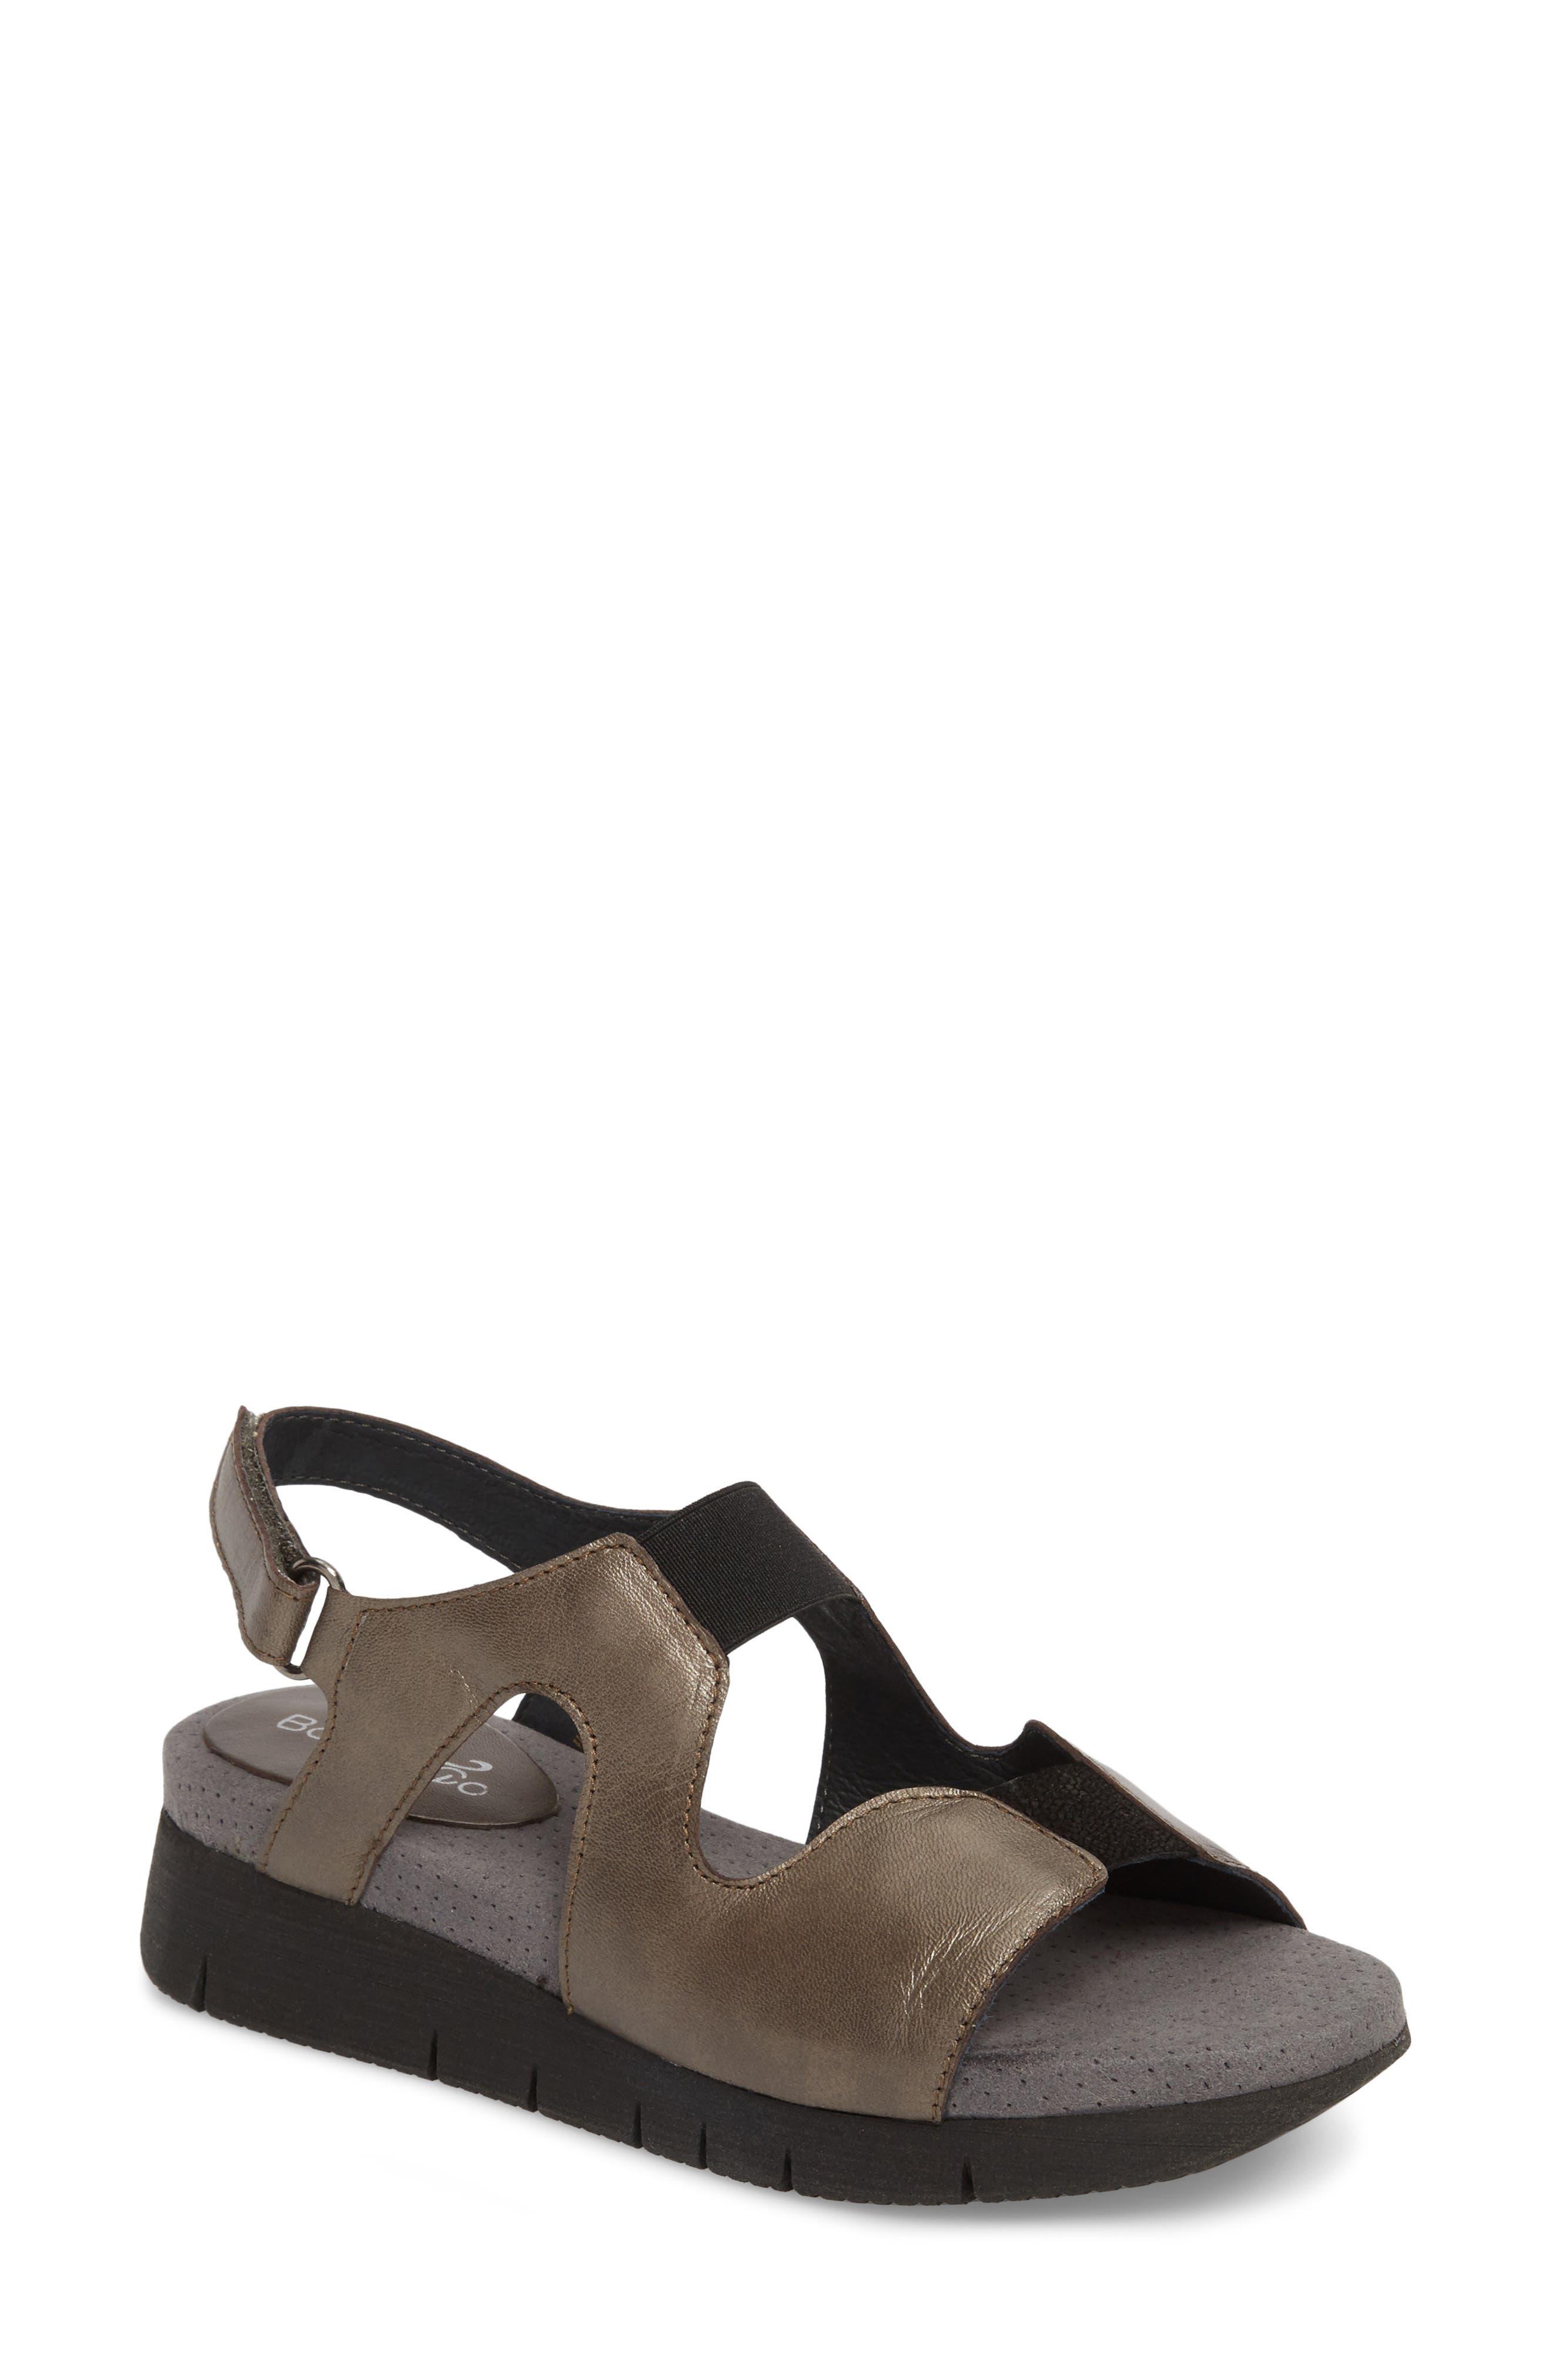 BOS. & CO. Pori Sandal, Main, color, PEWTER/ BLACK LEATHER